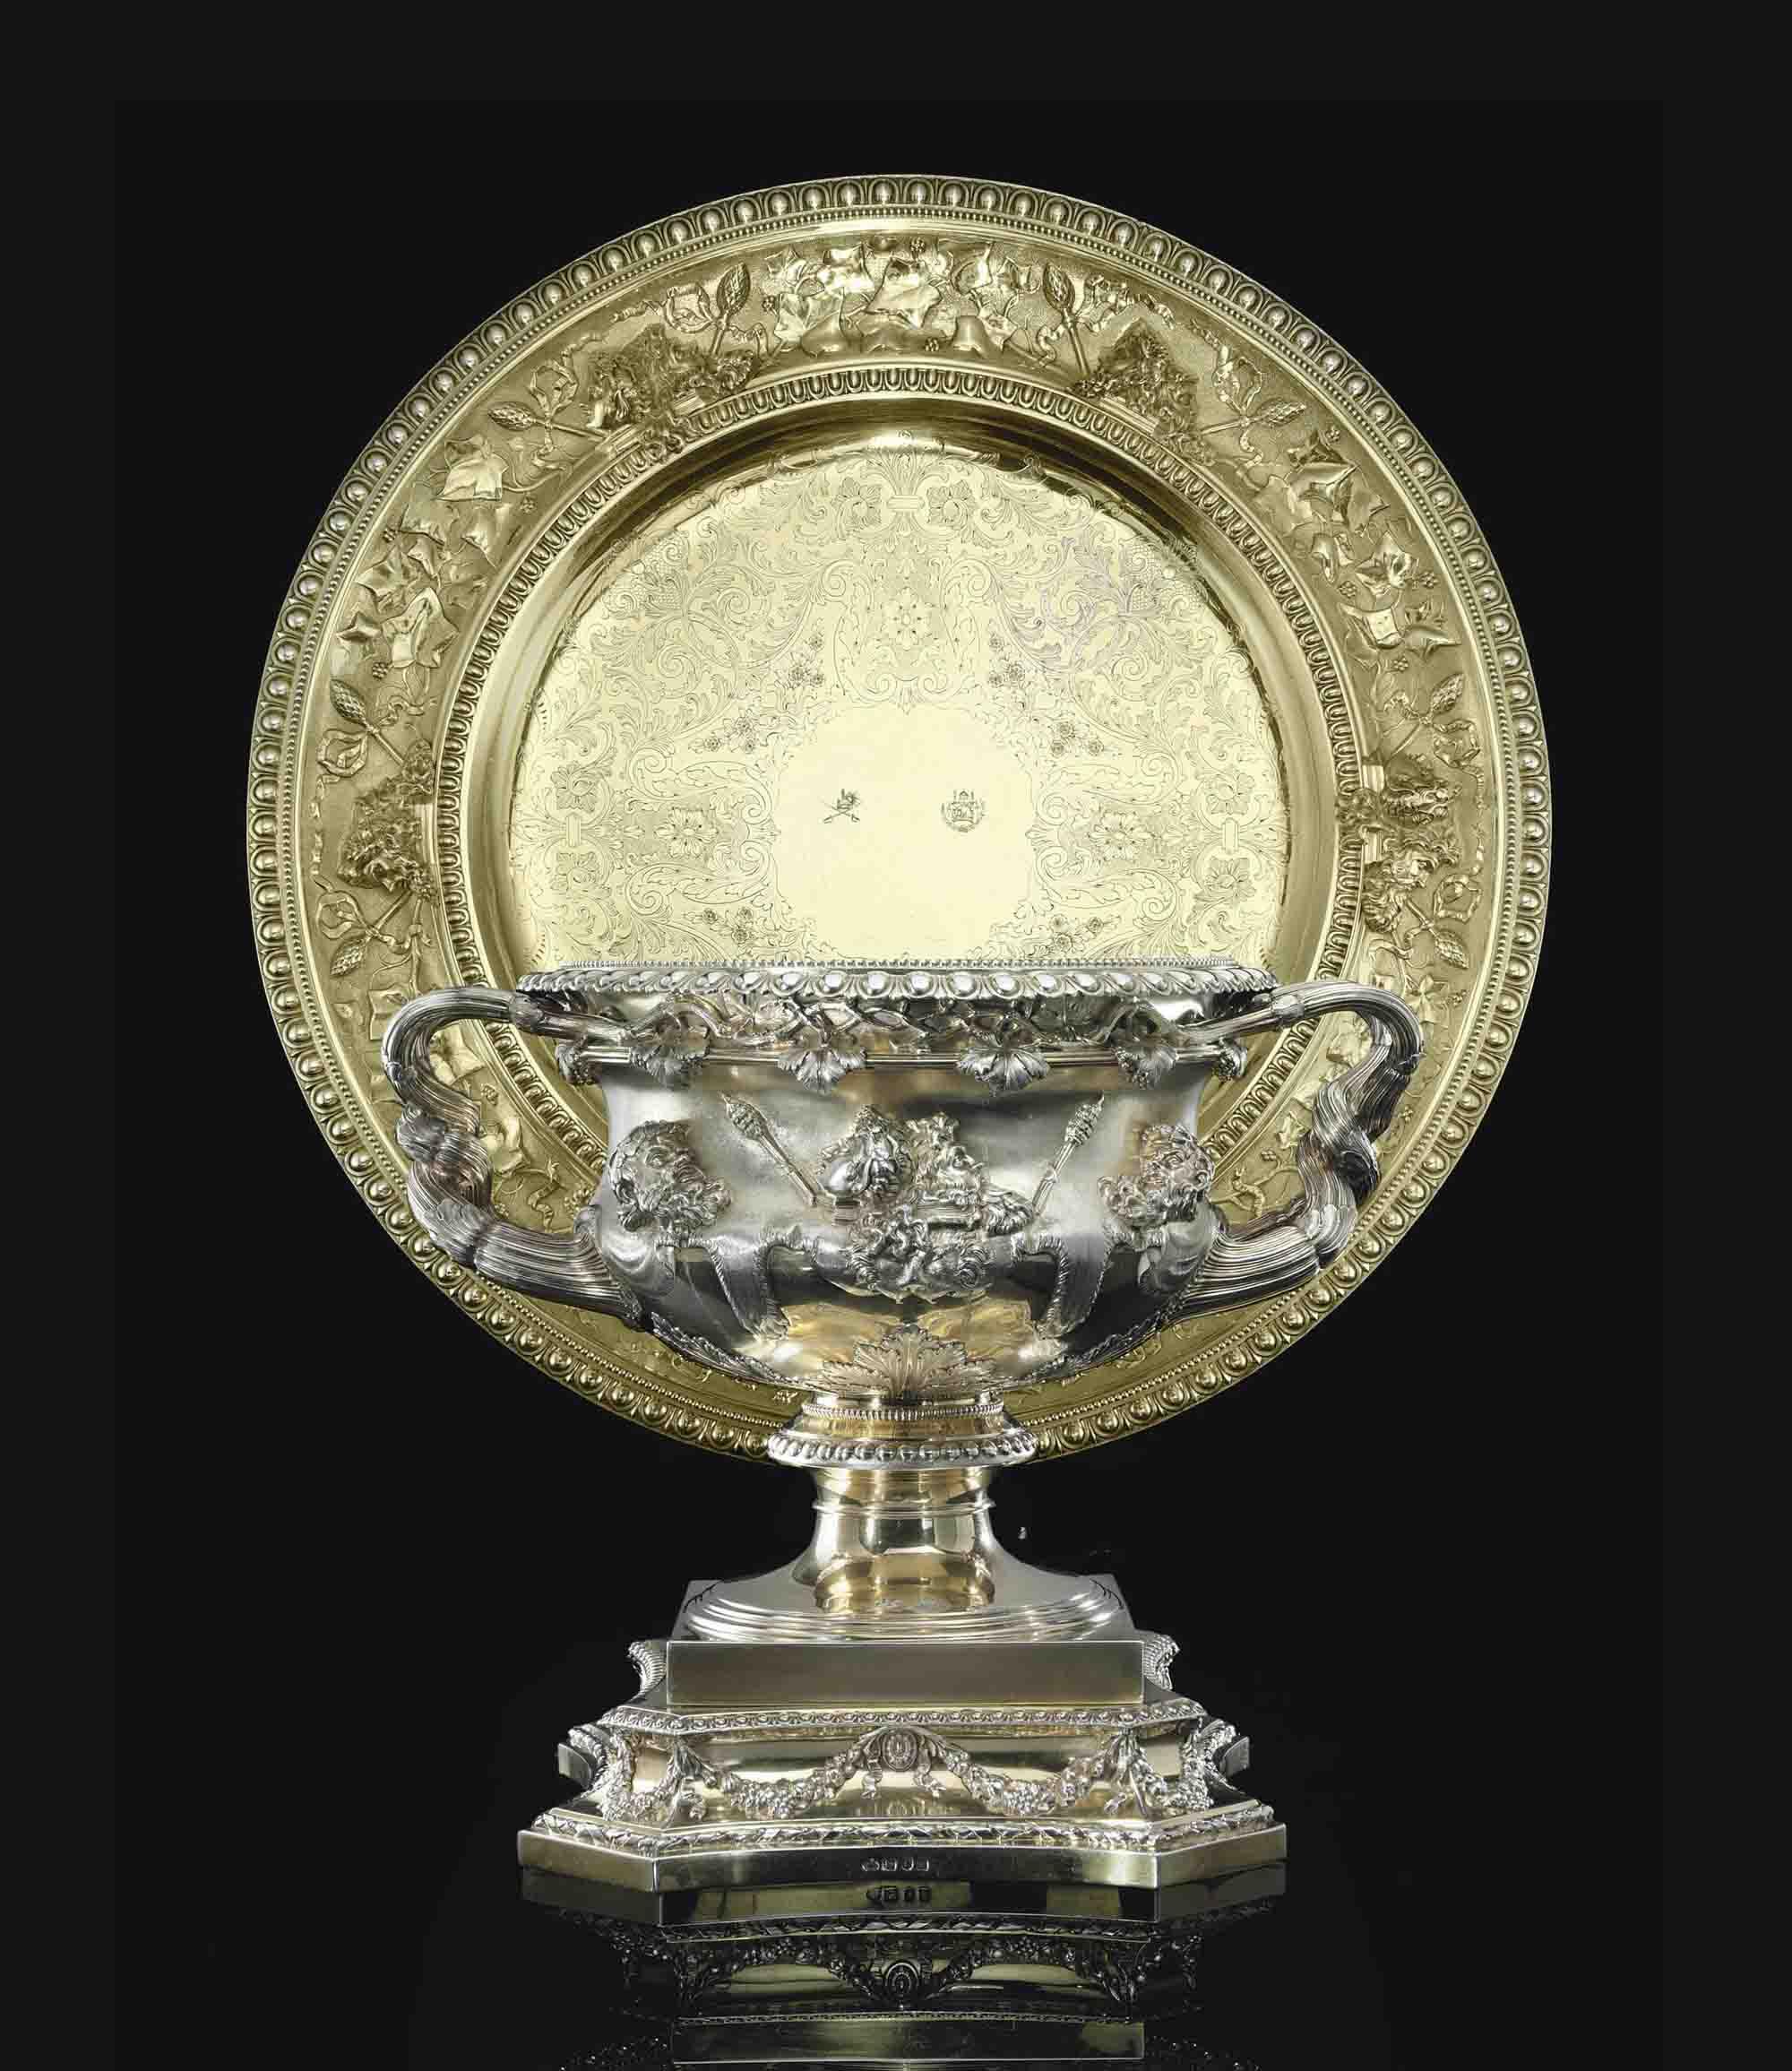 A MONUMENTAL EDWARD VII SILVER-GILT WARWICK VASE AND VICTORIAN SIDEBOARD DISH